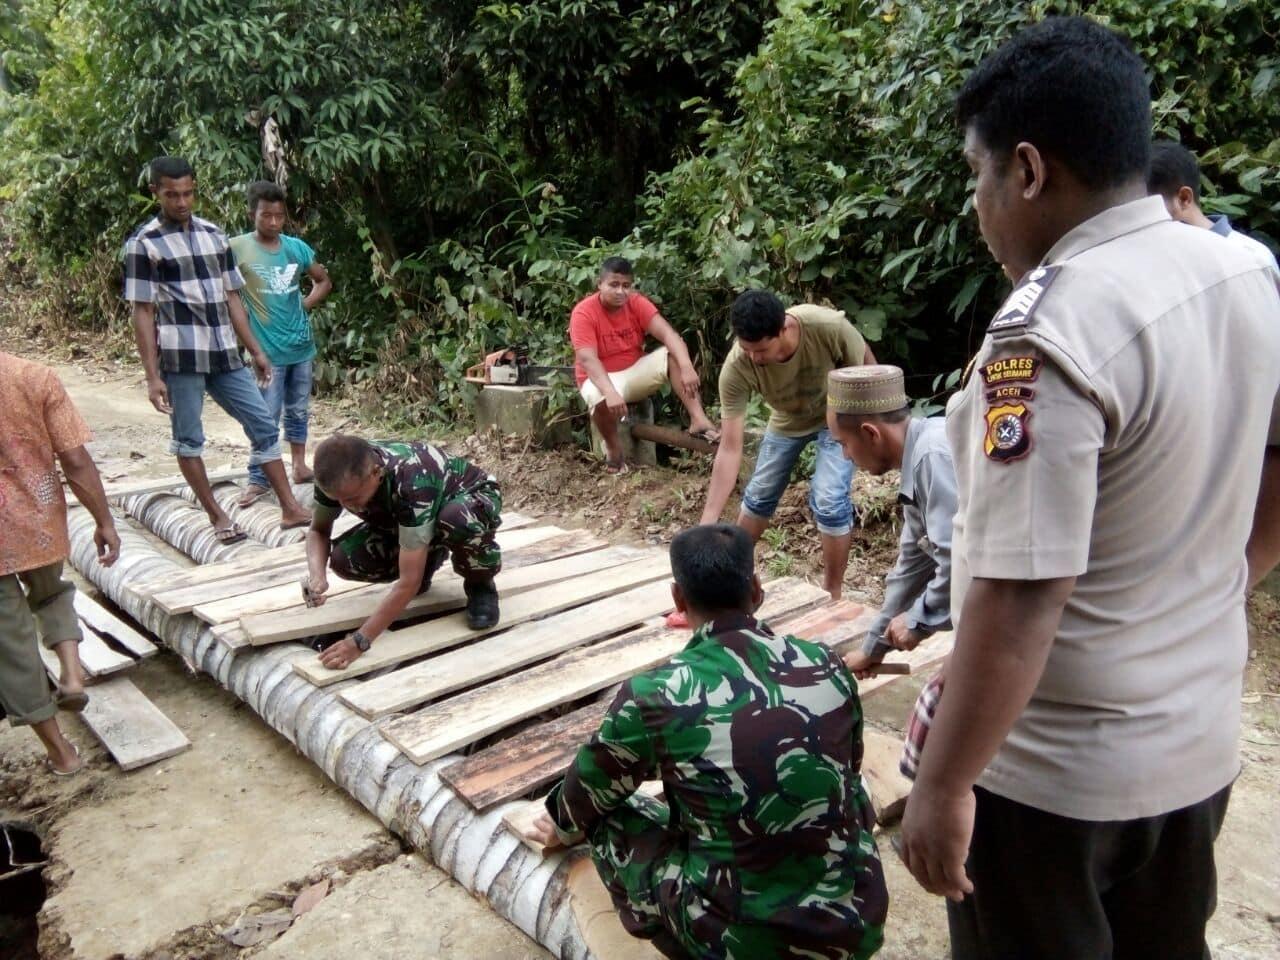 Koramil Simpang Keuramat Bersama Warga Bangun Jembatan Darurat